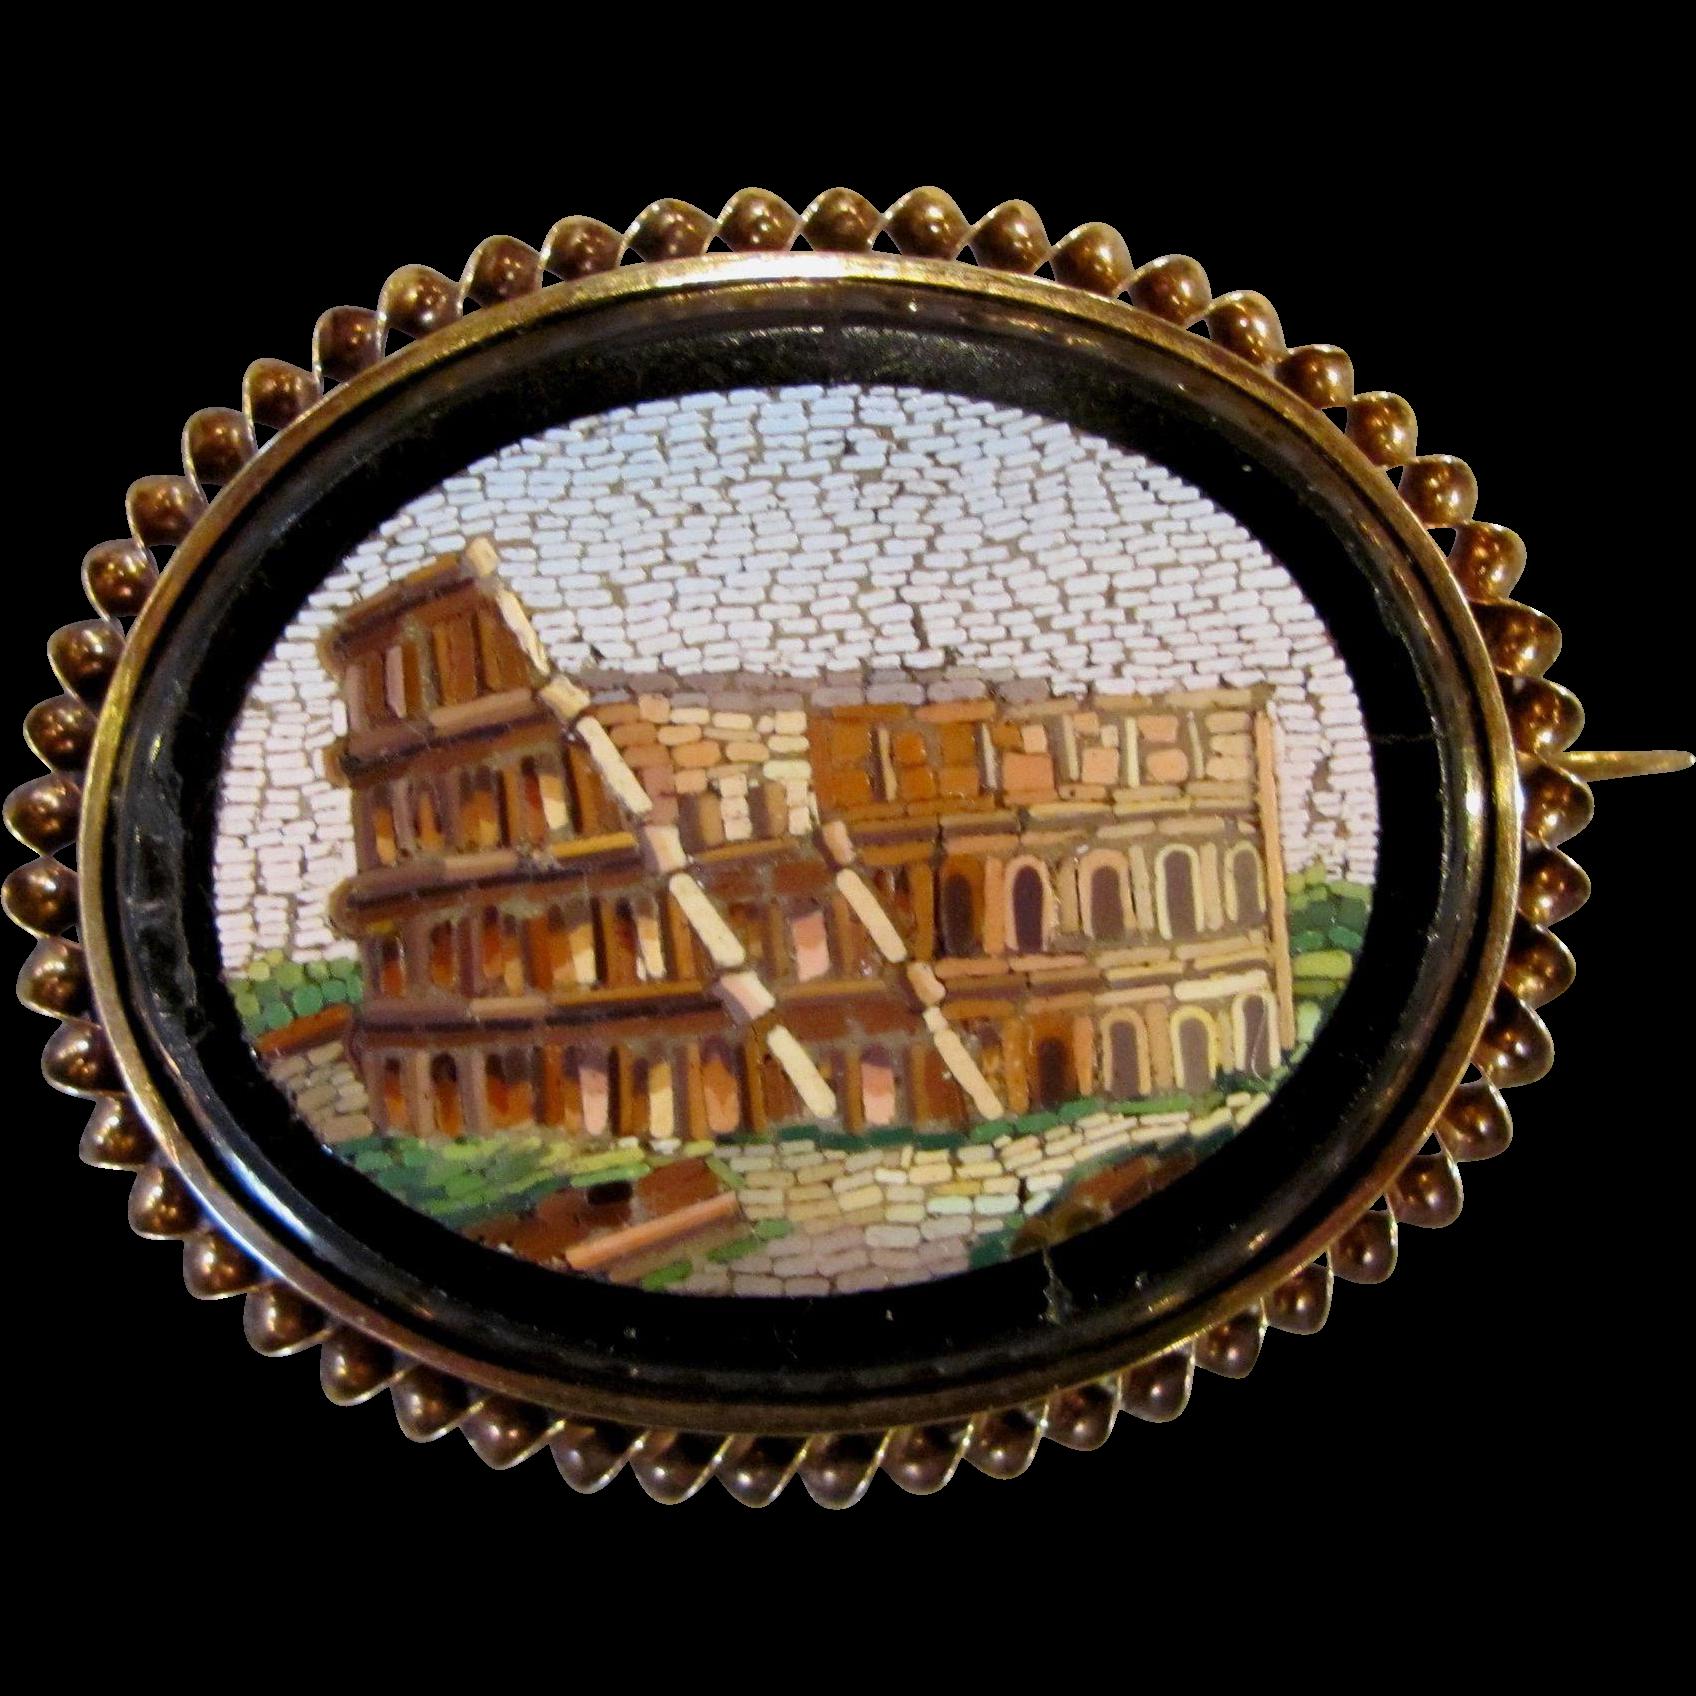 Antique Victorian 14K Micro Mosaic Colosseum Brooch Circa 1860